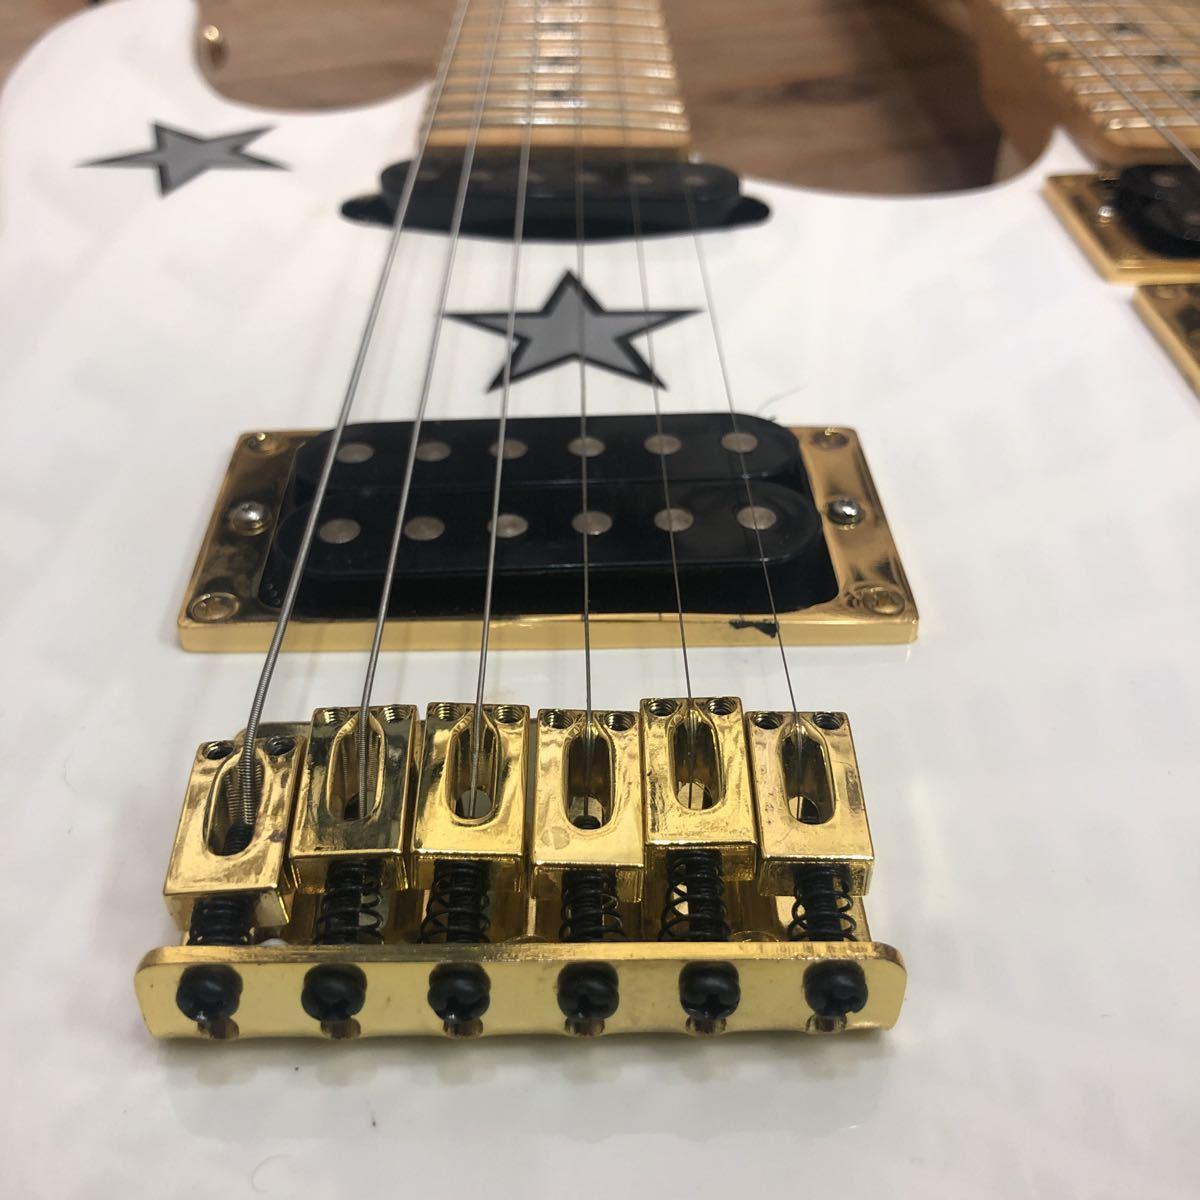 XM☆希少 KRAMER Richie sambora/Bon Jovi signature 激レア ダブルネック エレキギター リッチー・サンボラ モデル FLOYD ROSE搭載 美品_画像5